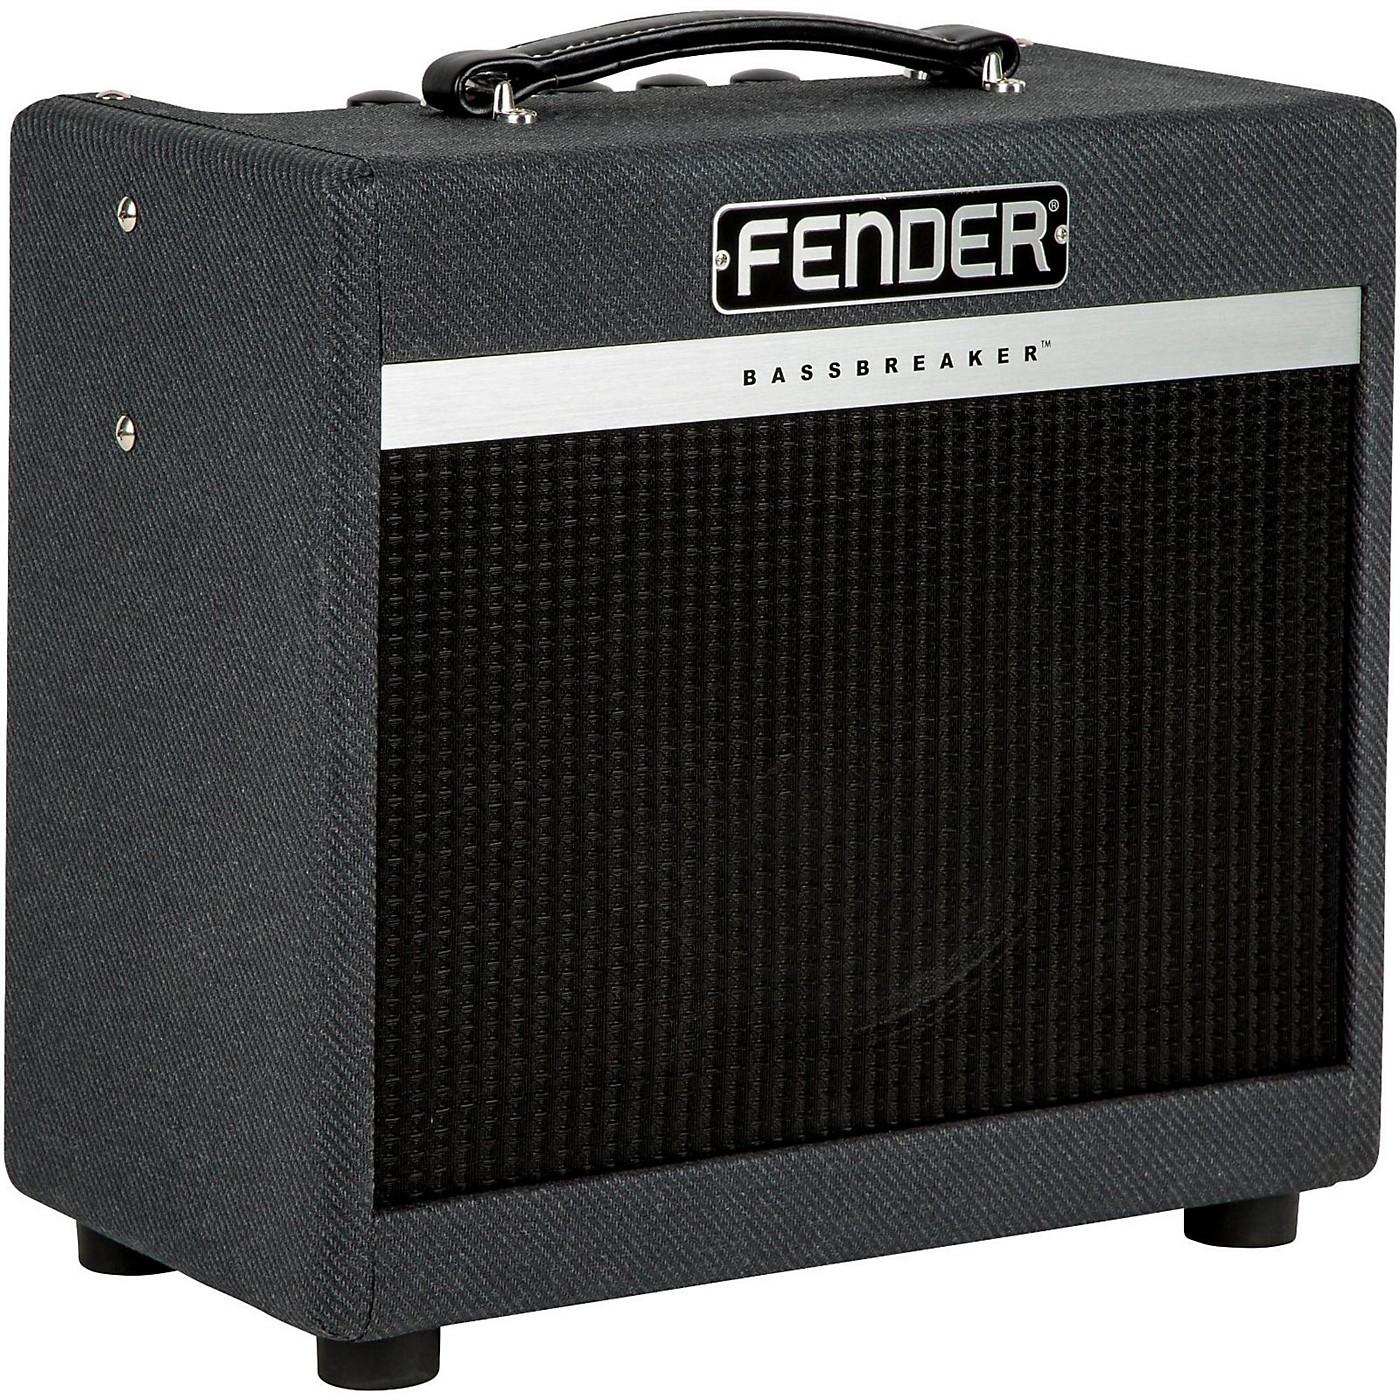 Fender Bassbreaker 007 1x10 7W Tube Guitar Combo Amp thumbnail